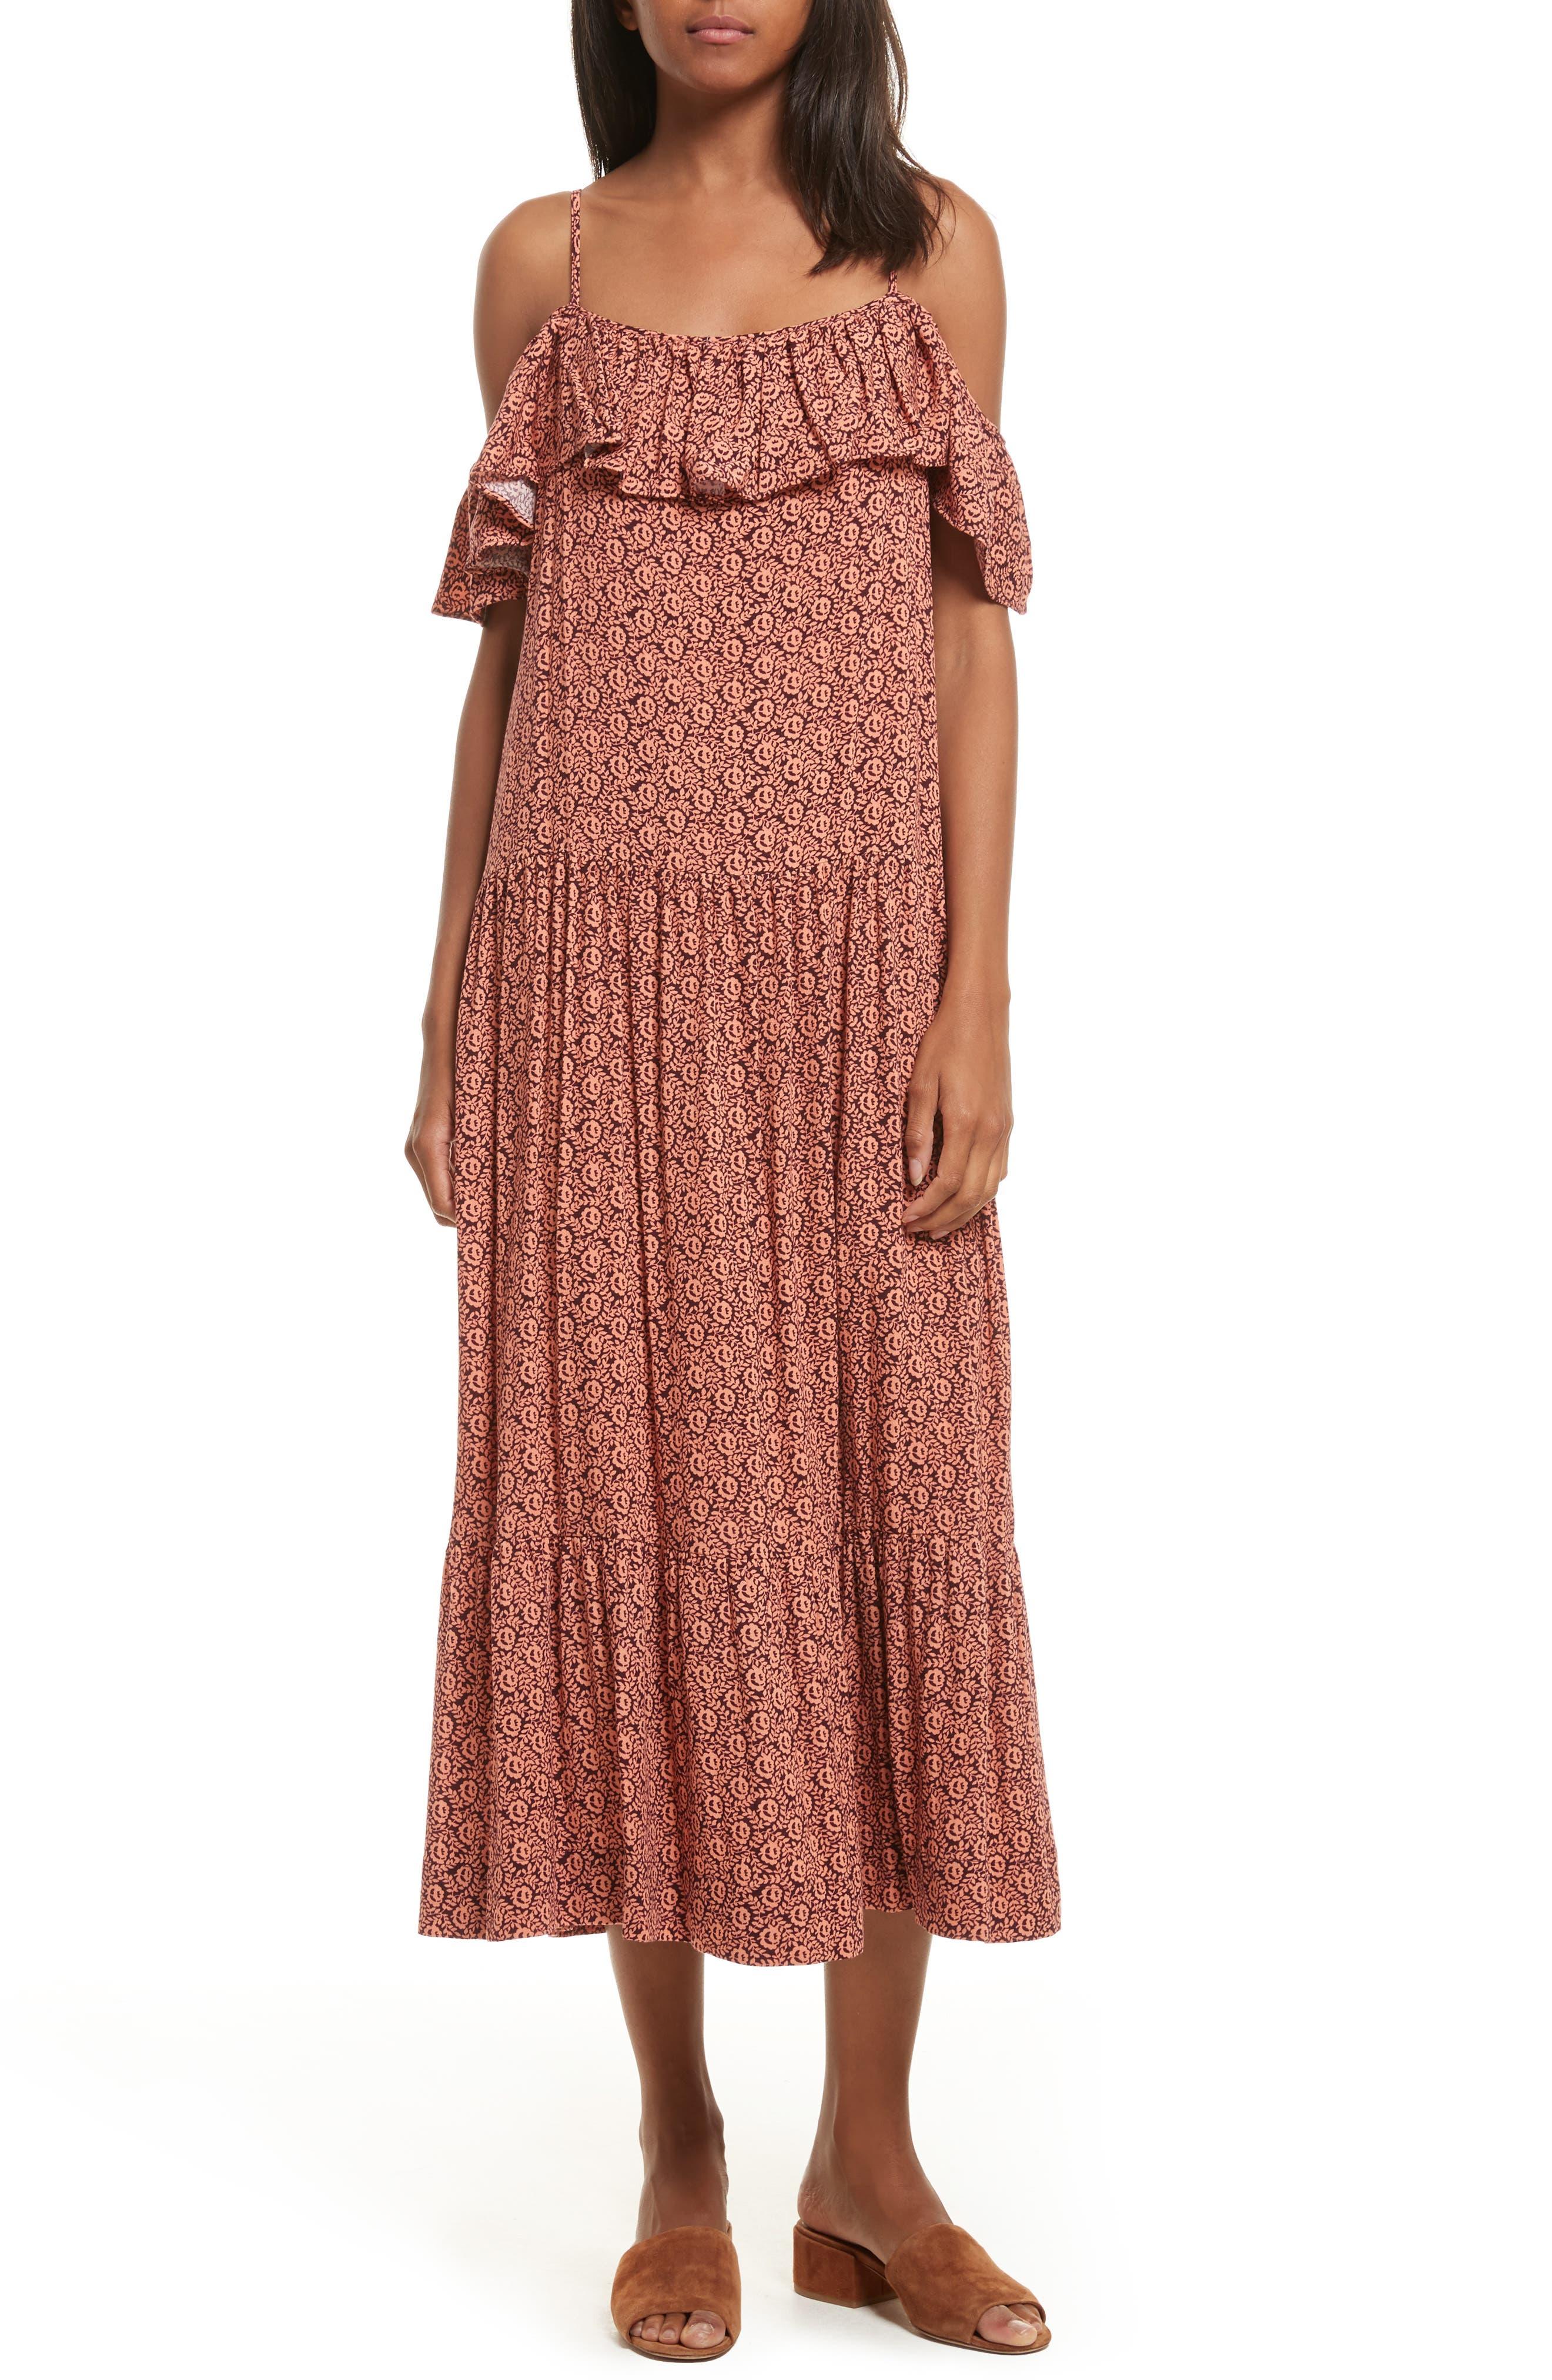 Alternate Image 1 Selected - Rebecca Minkoff Lapaz Off the Shoulder Midi Dress